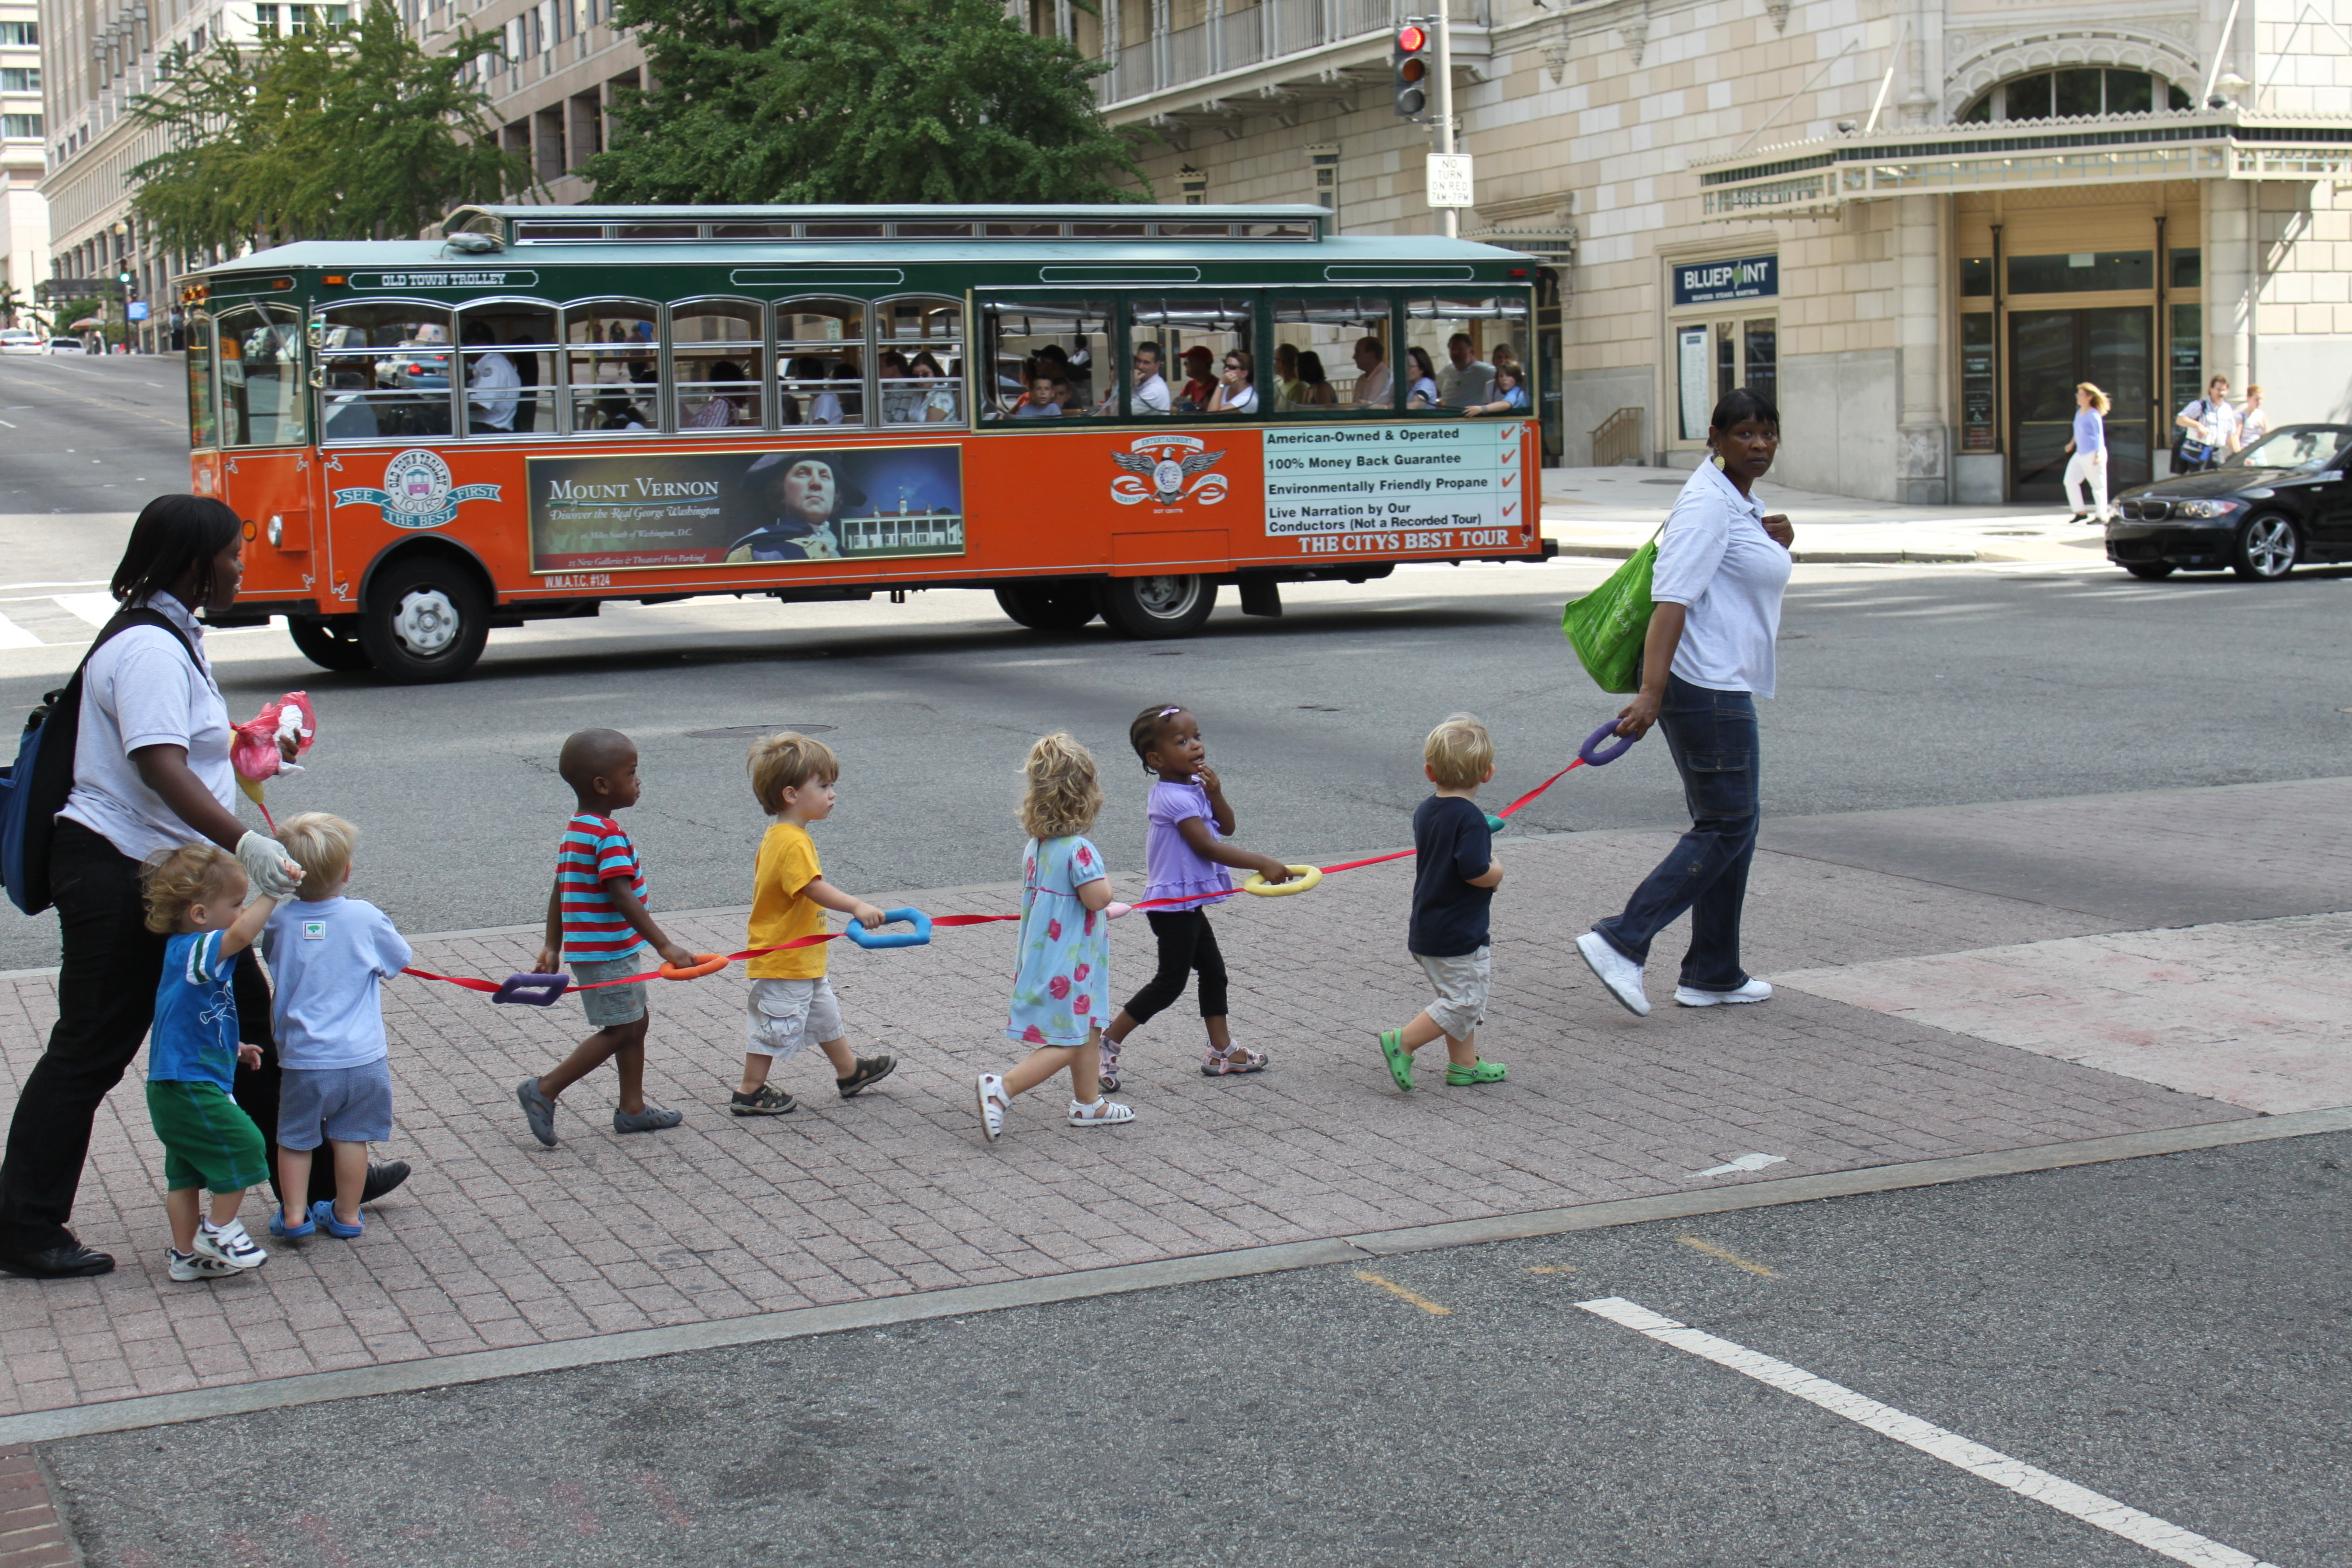 """children crossing the street"" by Mélih on Flikr"